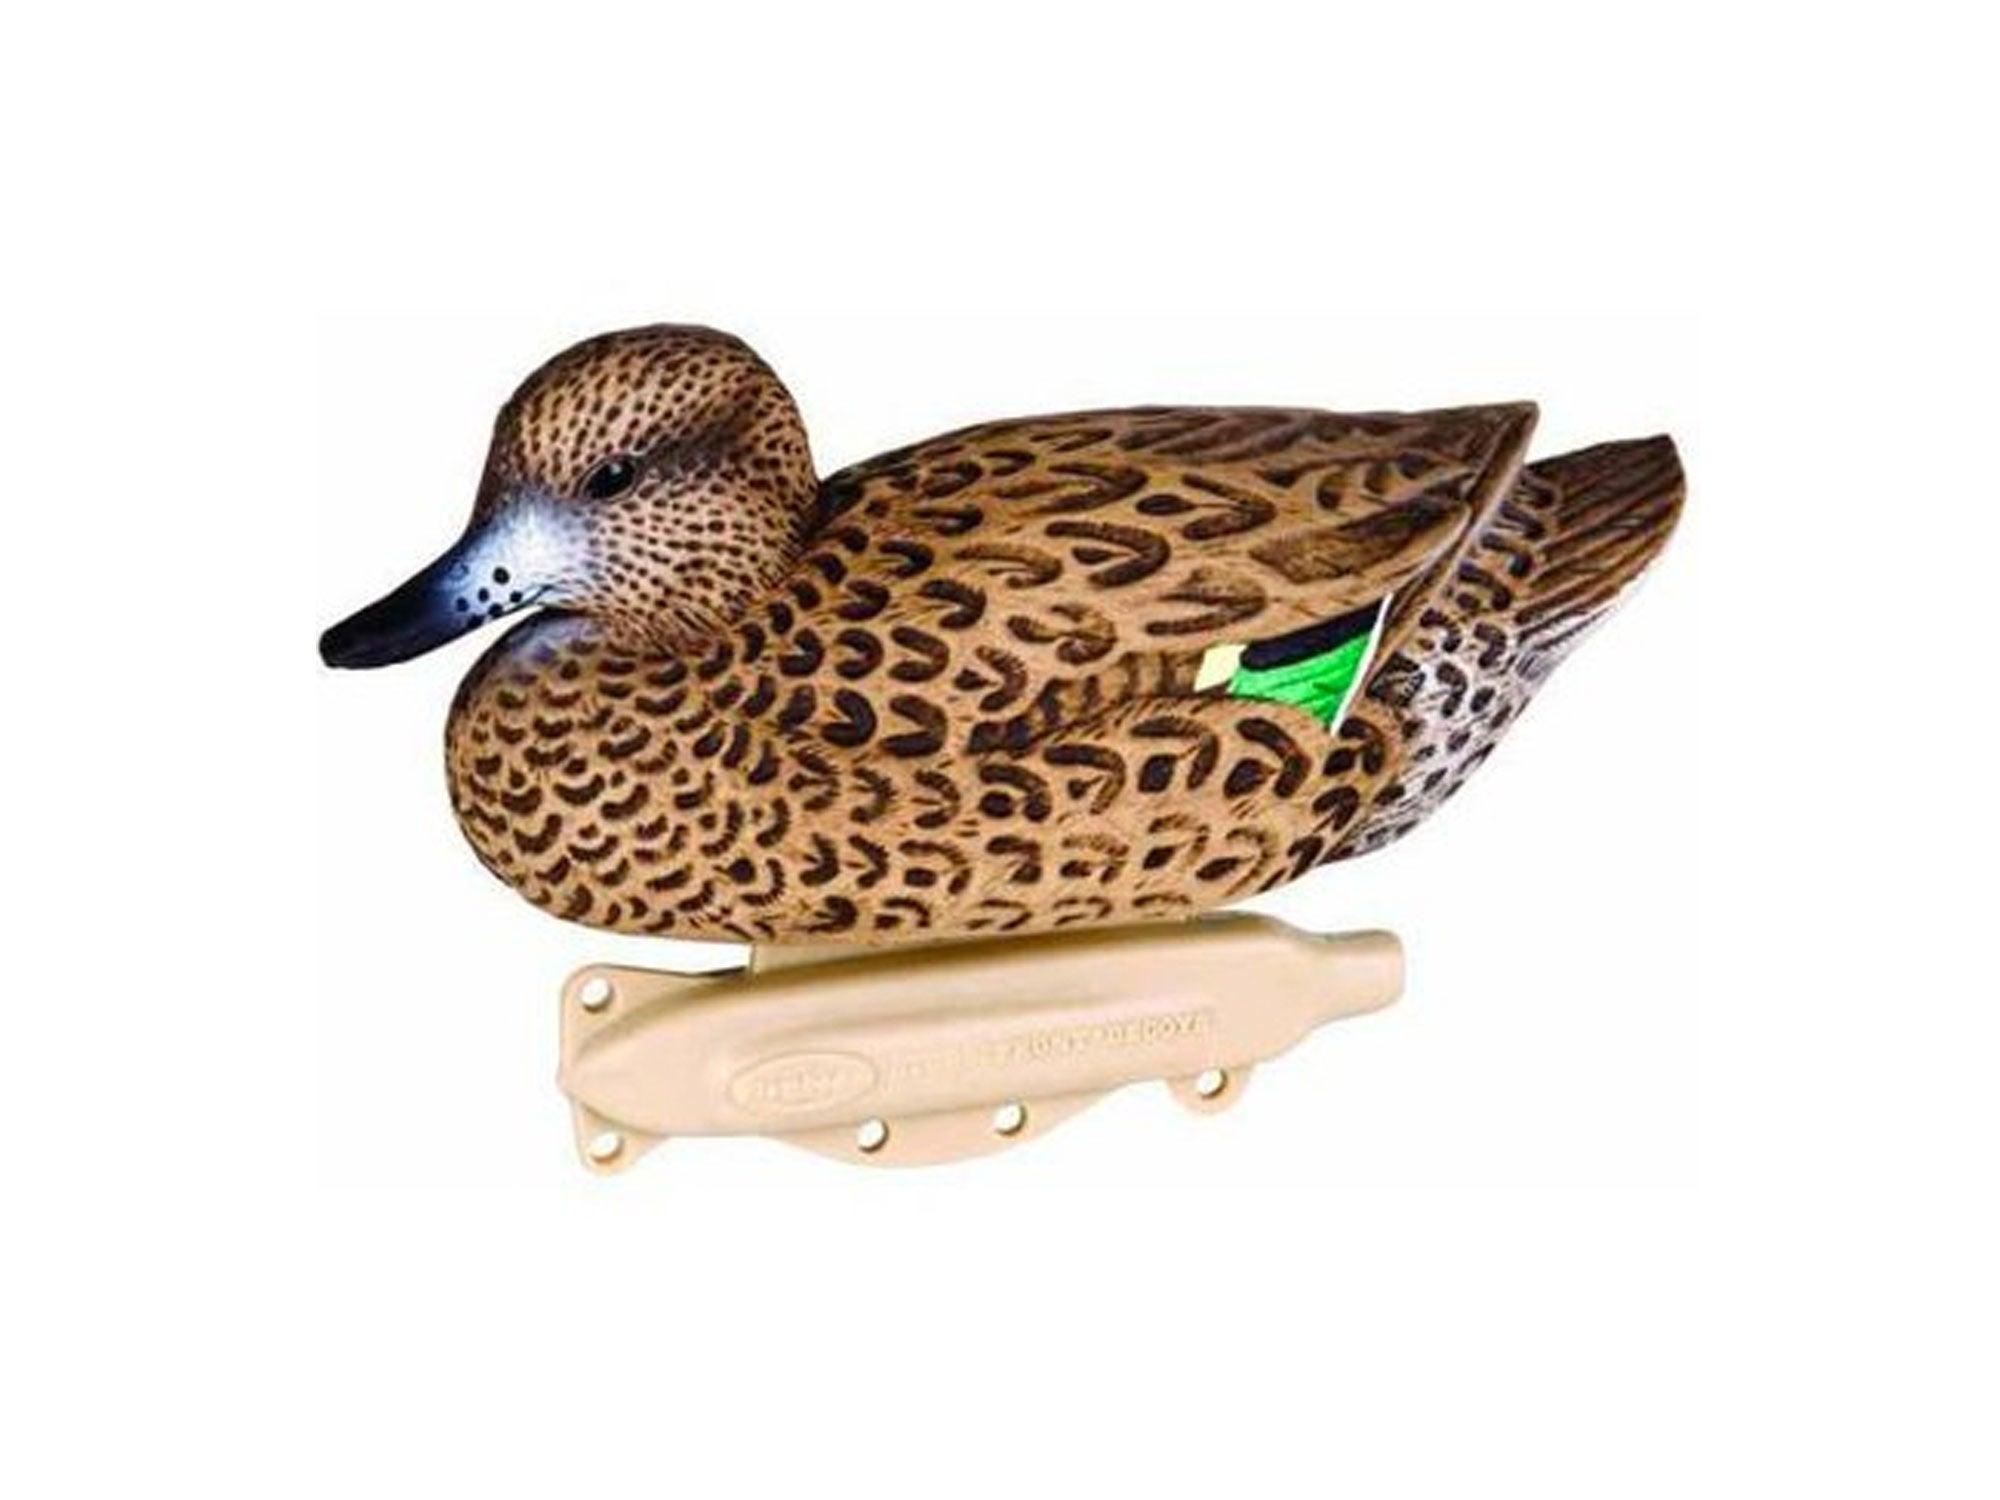 Pintail duck decoy